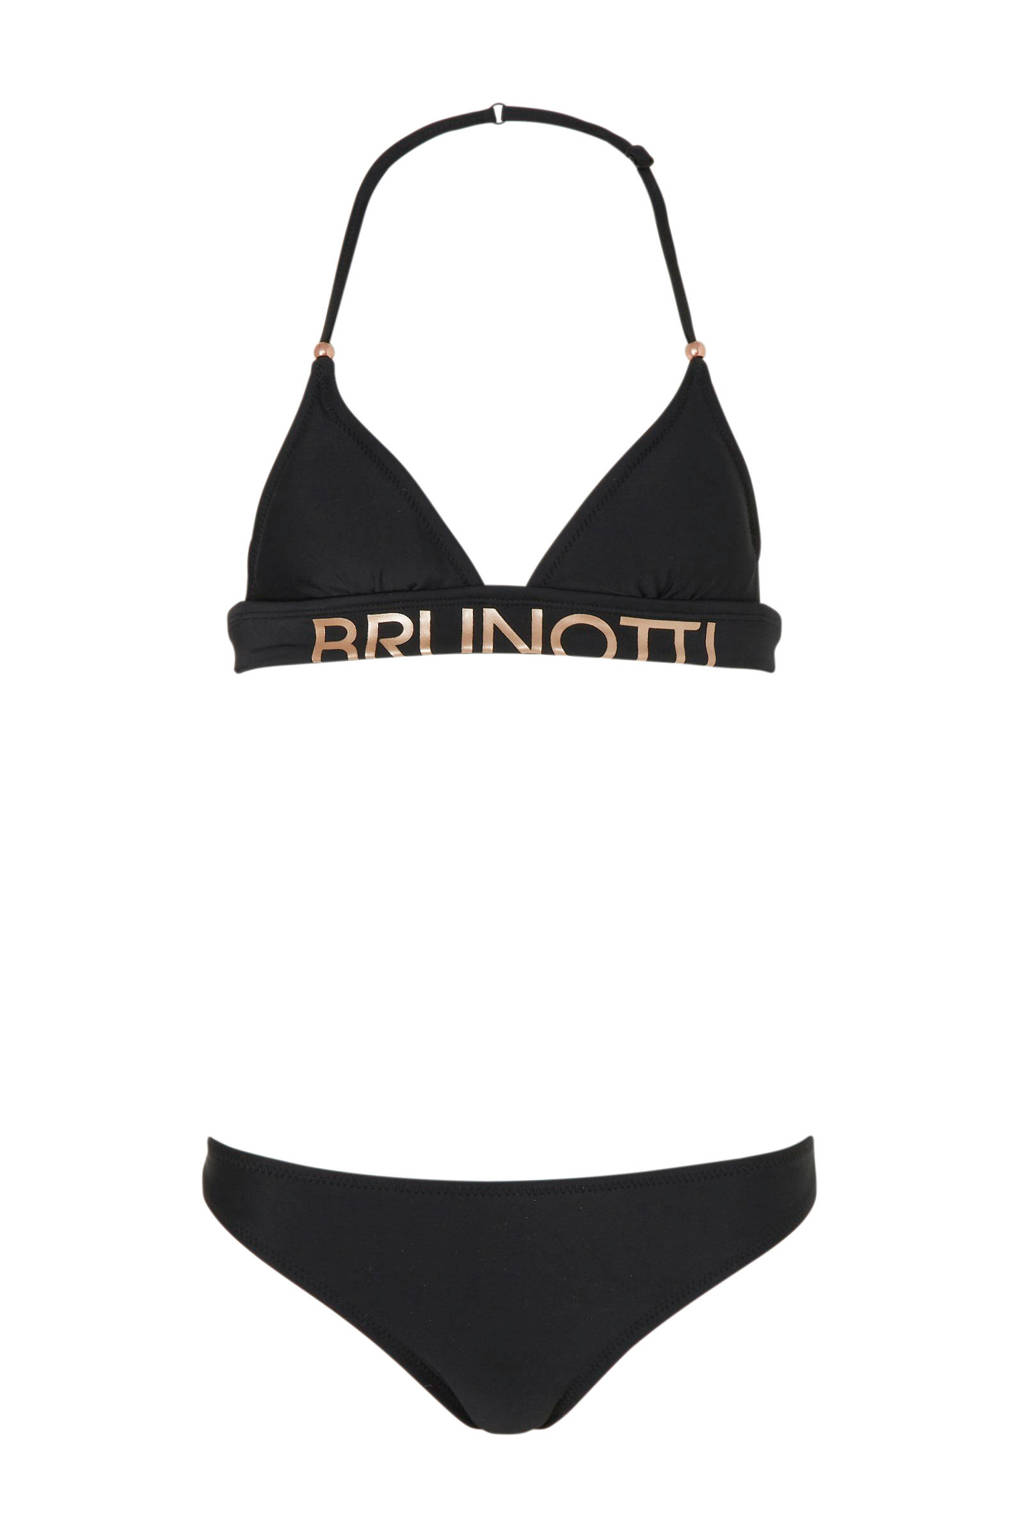 Brunotti halterbikini Irenea met logo zwart, Zwart/goud